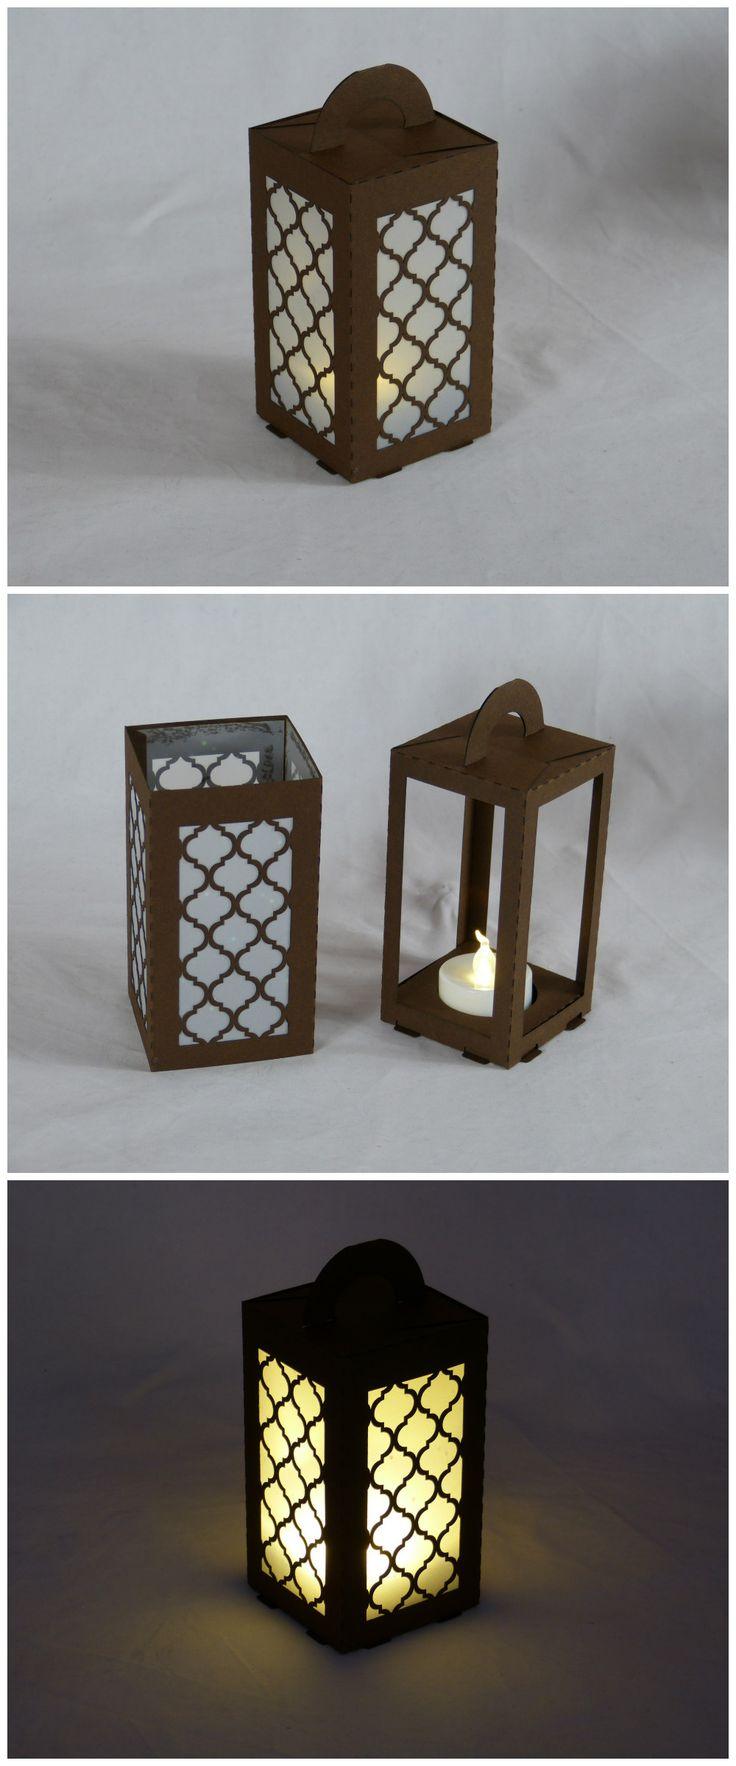 lasercut paper lantern for led tea light moroccan. Black Bedroom Furniture Sets. Home Design Ideas